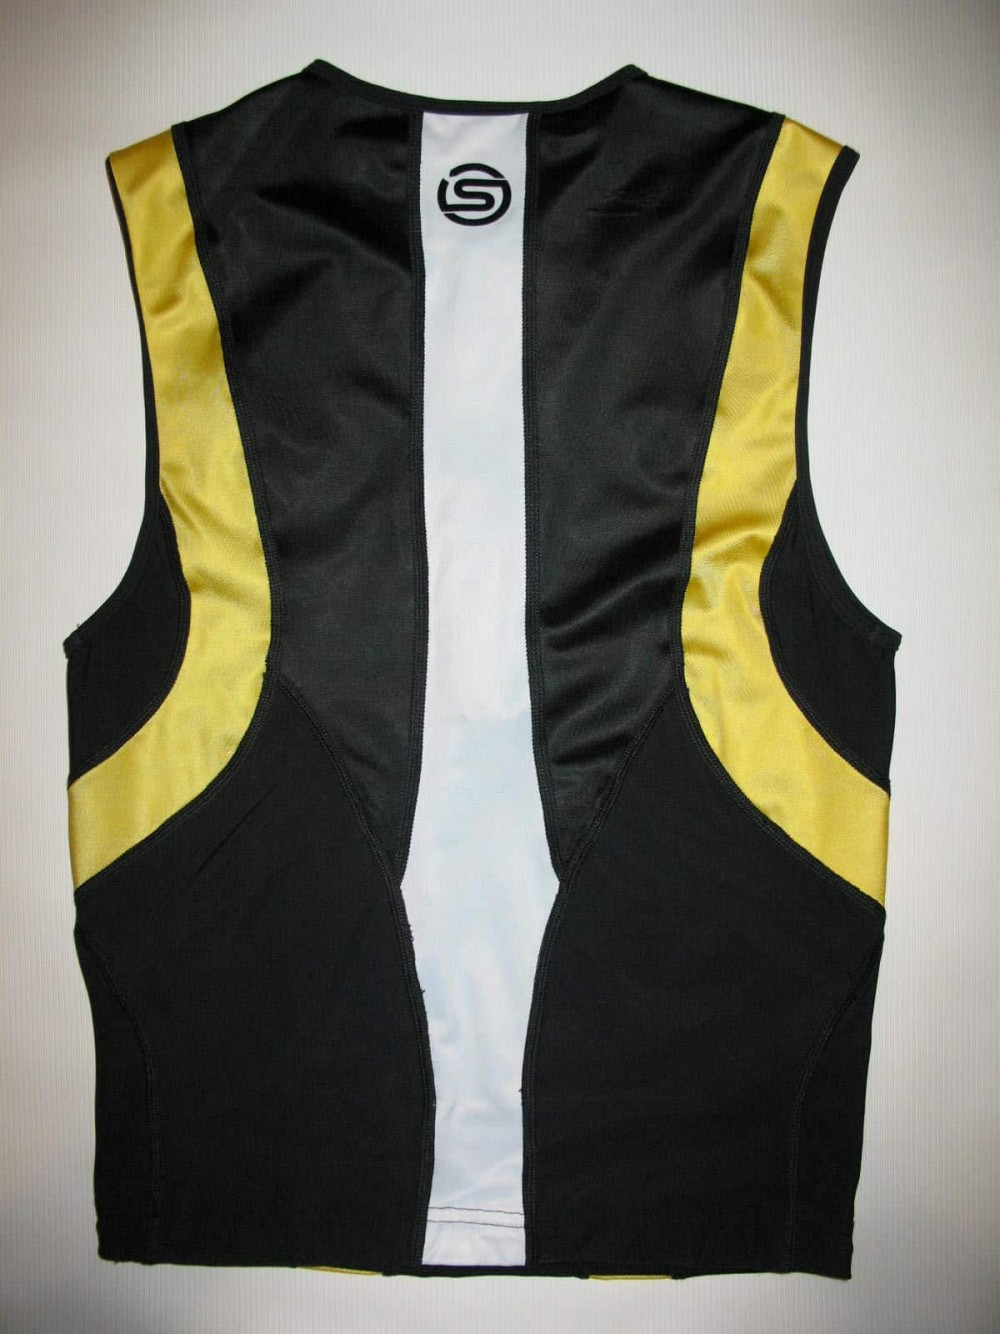 Футболка SKINS TRI400 compression ss jersey (размер M) - 2